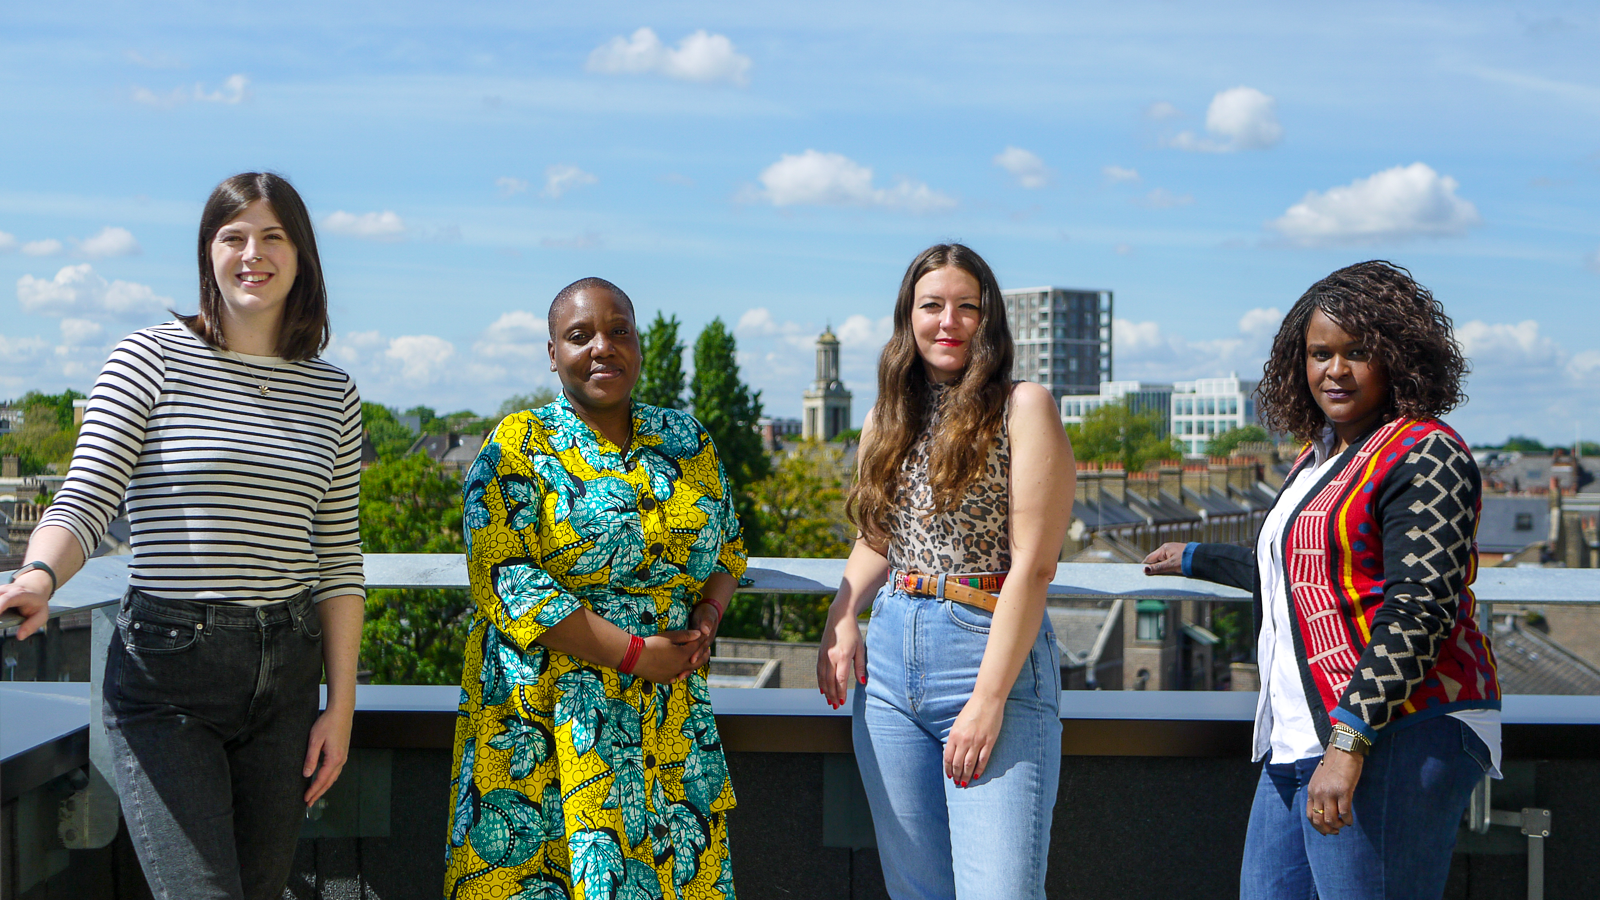 Pictured L-R: Lani Strange, Oluwatoyin Odunsi, Ruth Hawkins, Nonny Nkomo. On the roof of Brixton House, may 2021.